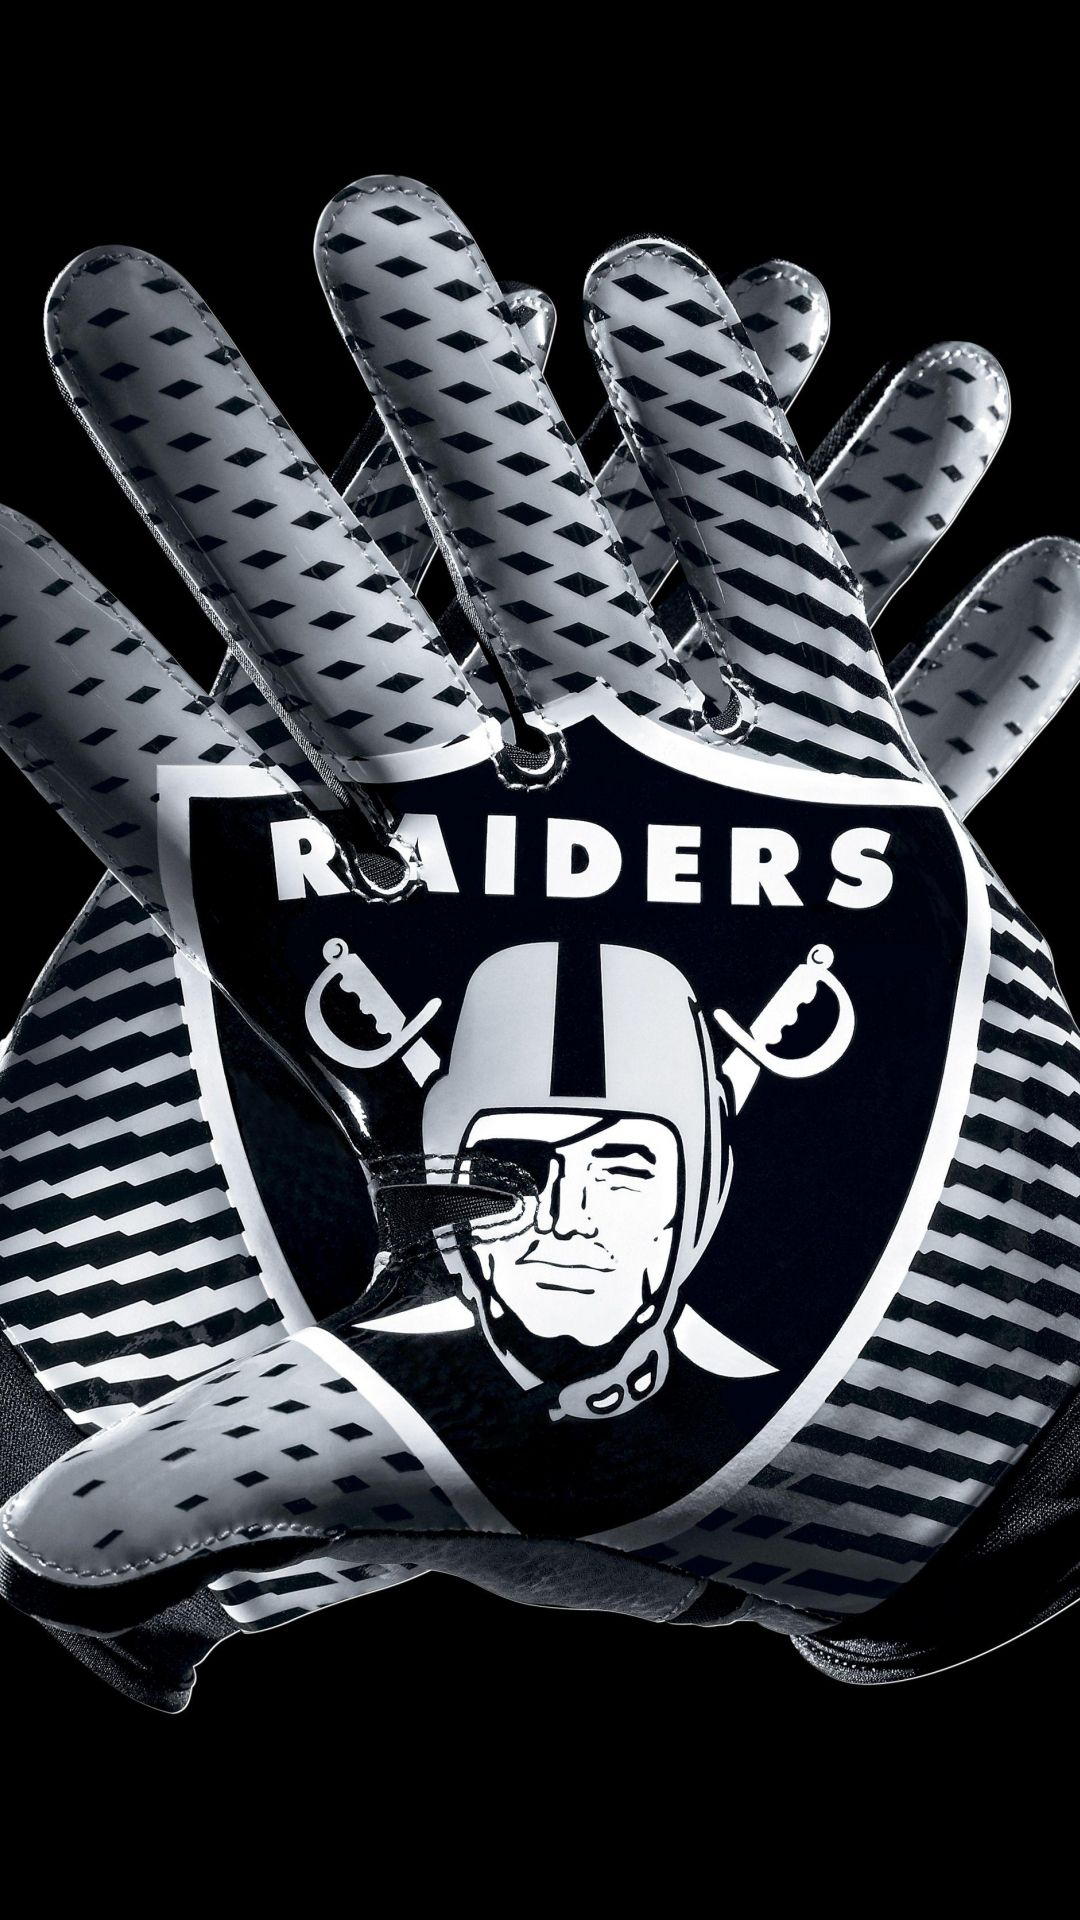 Raiders iPhone hd wallpaper